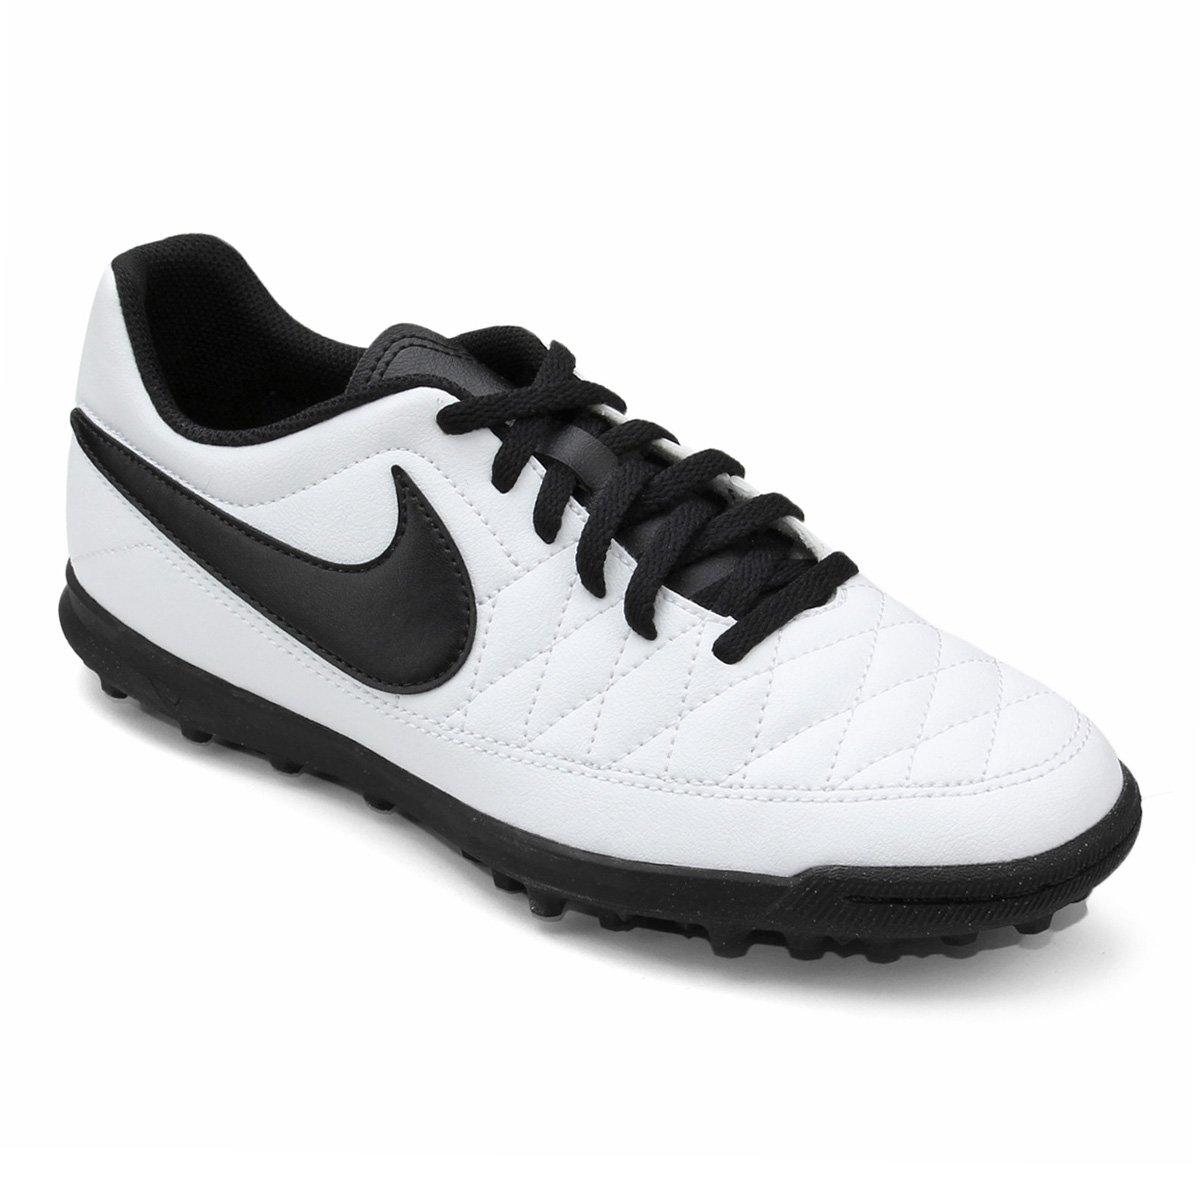 777c9d0766 Chuteira Society Nike Majestry TF - Branco e Preto - Compre Agora ...